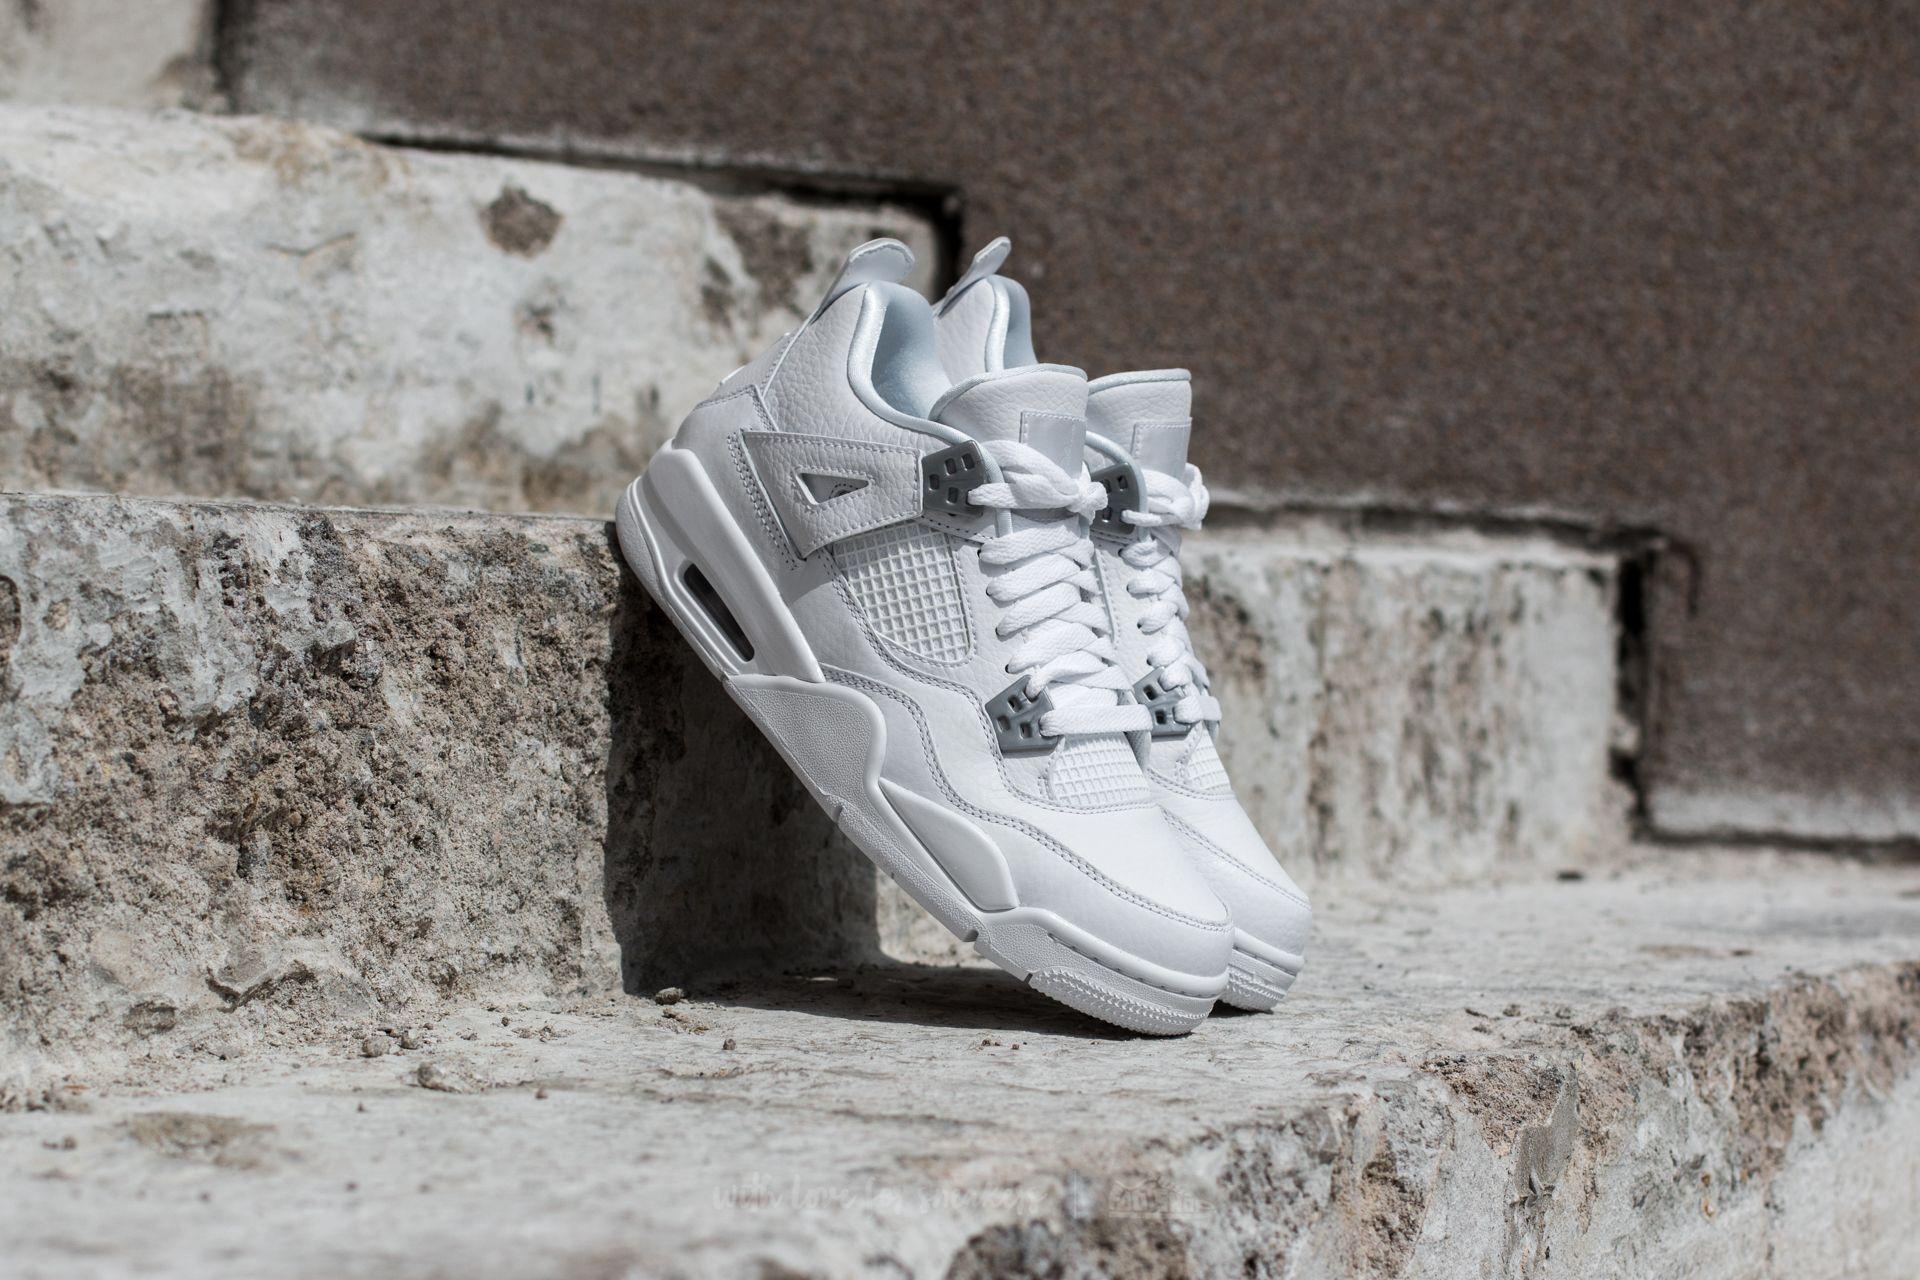 Air Jordan 4 Retro BG 'Pure Money' White/ Metallic Silver